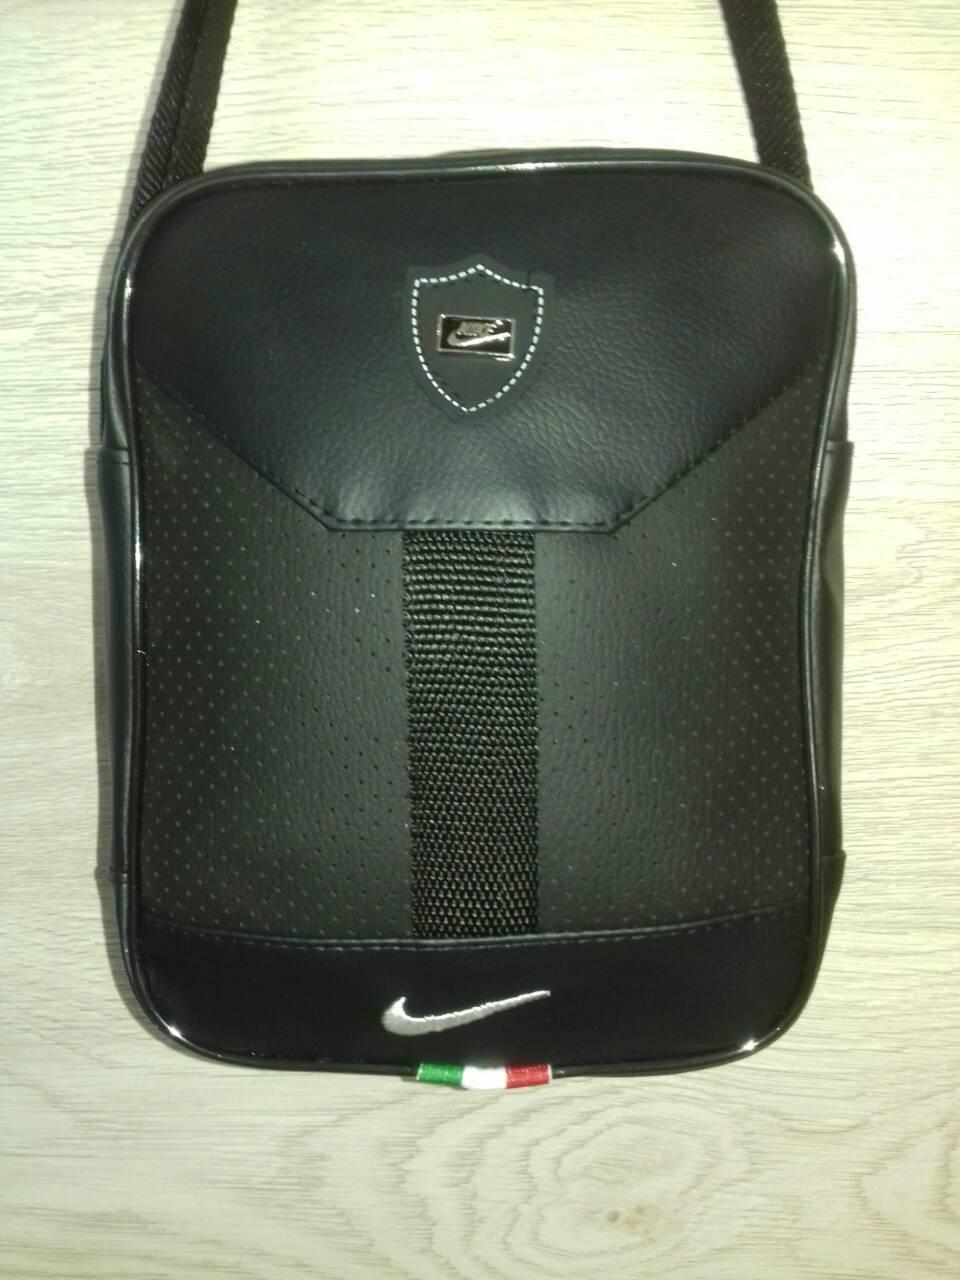 a4ff16a8 Мужская сумка барсетка Nike спортивная через плечо оптом - Torizo в Харькове